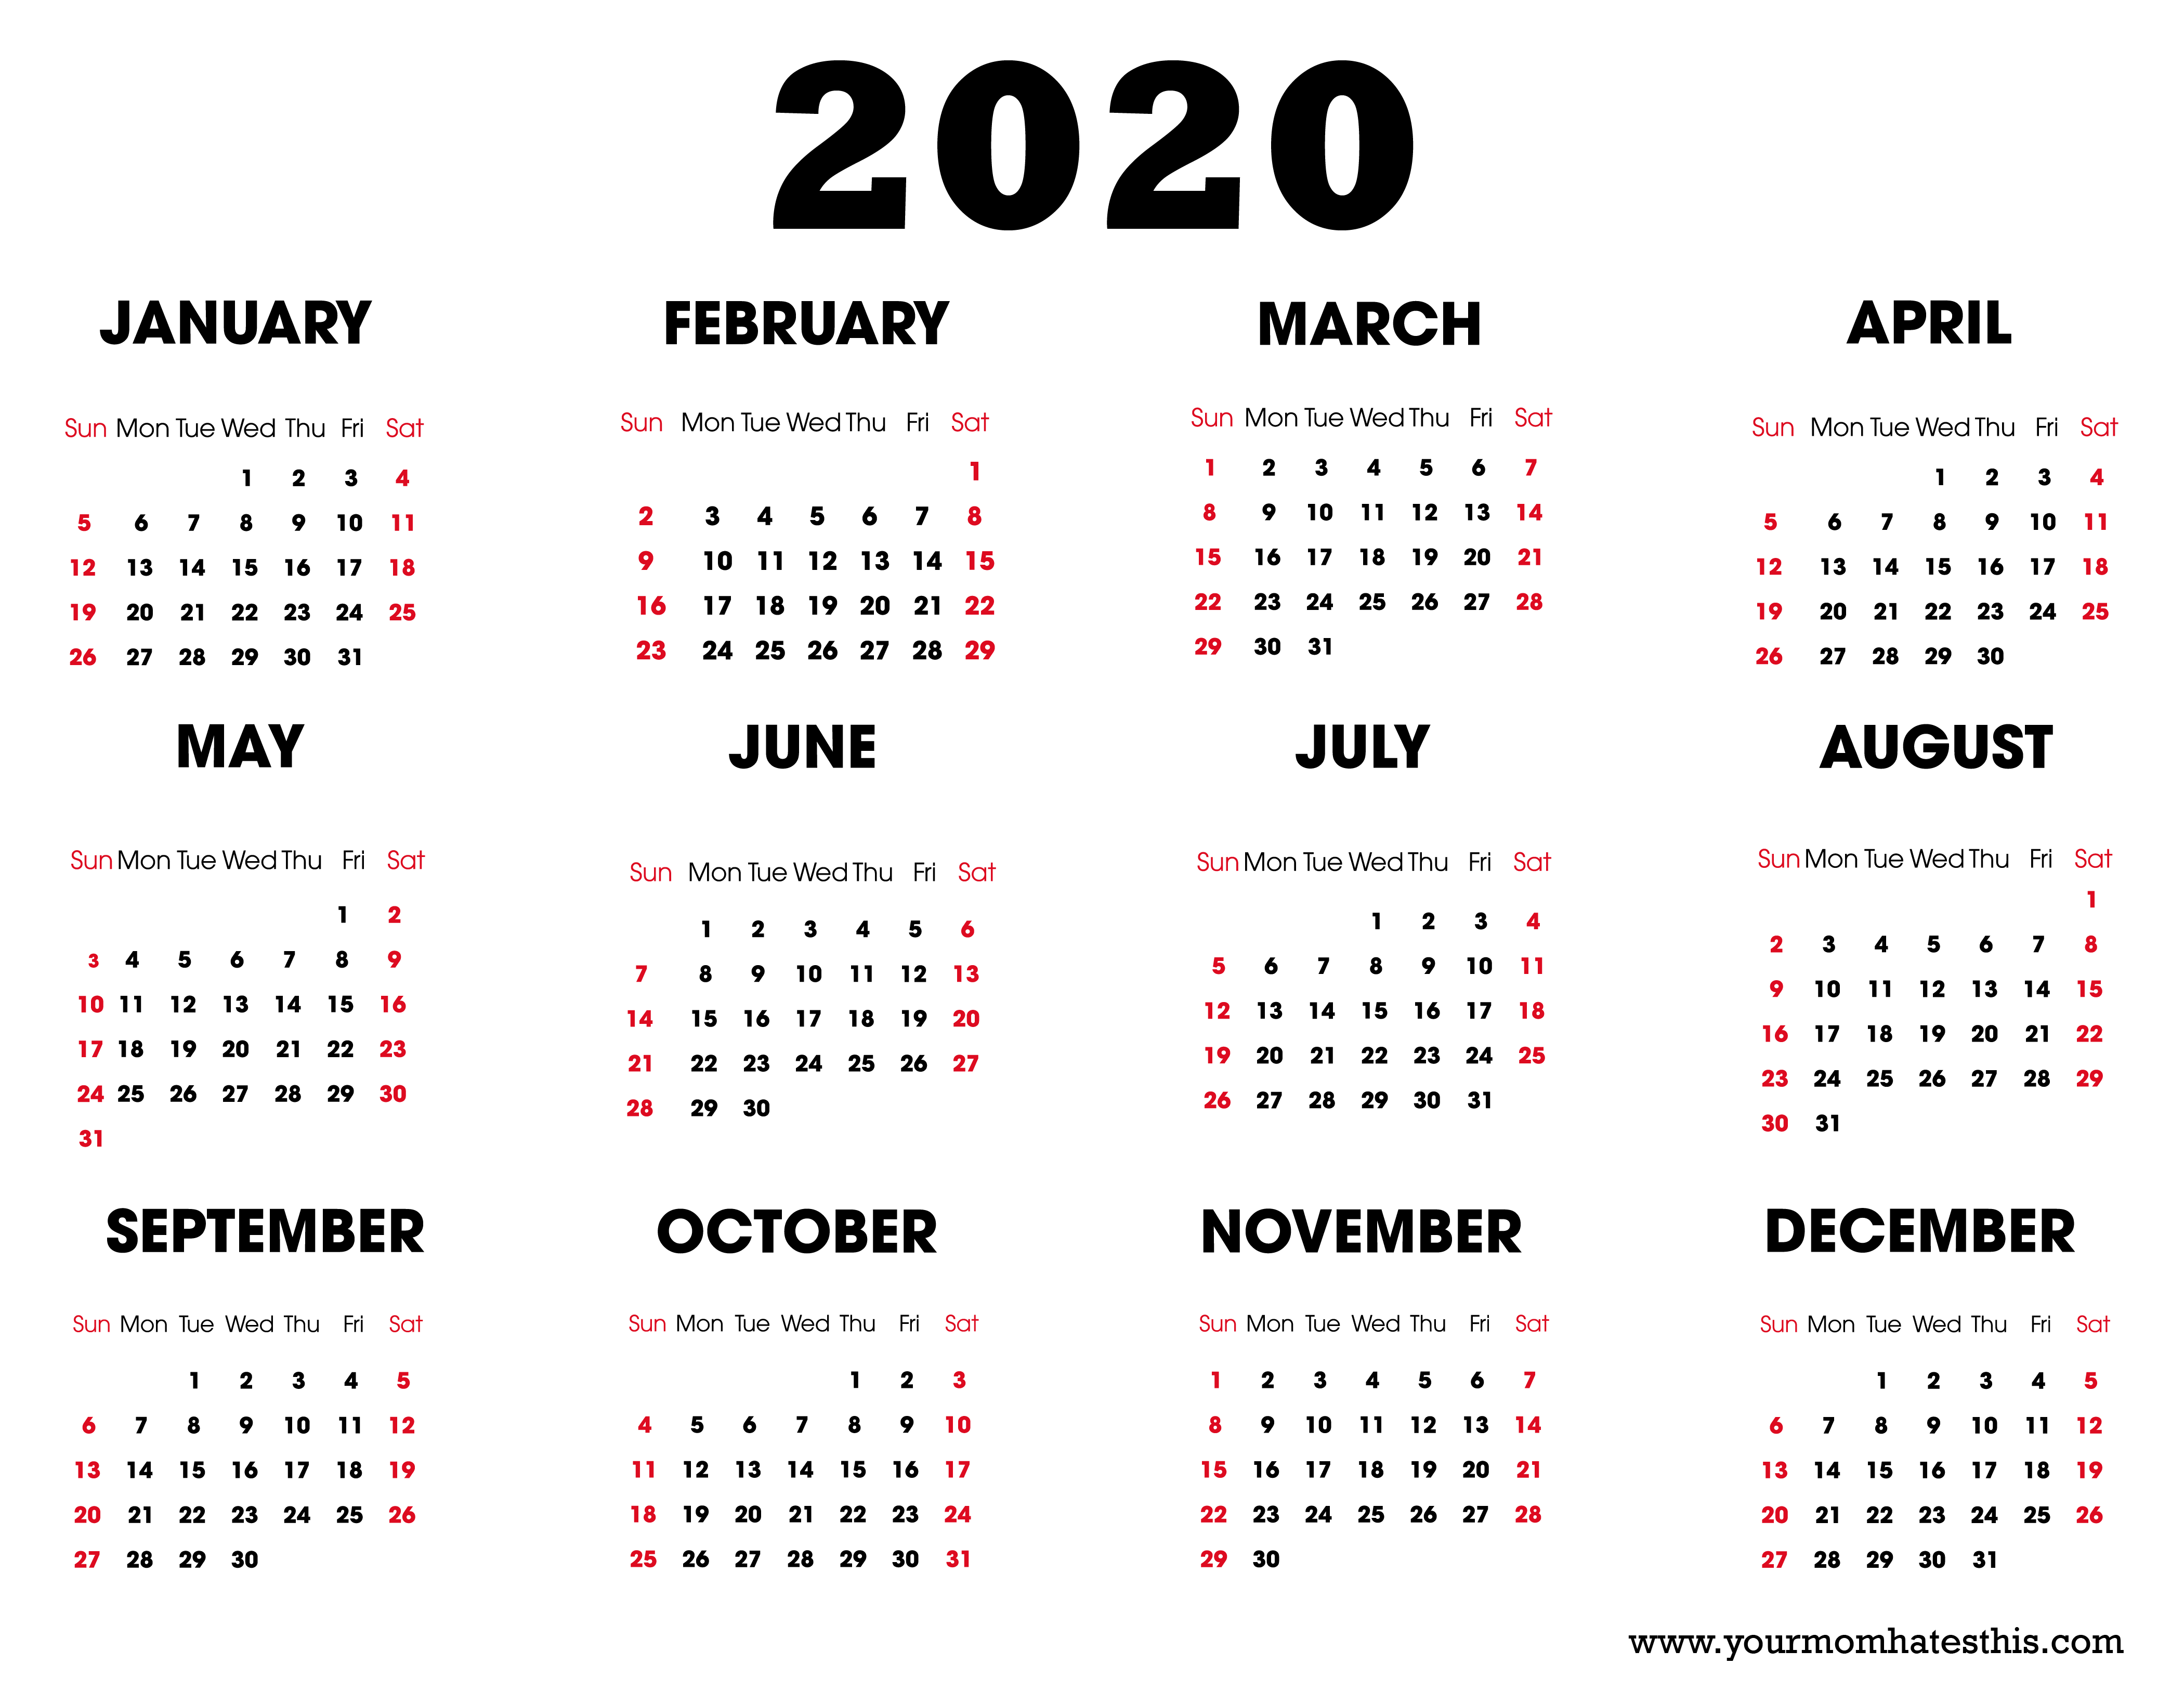 2020 Calendars White Background Black Text Red Holidays 2020 Calendar Free Printable Calendar Templates Printable Calendar Template Printable Blank Calendar